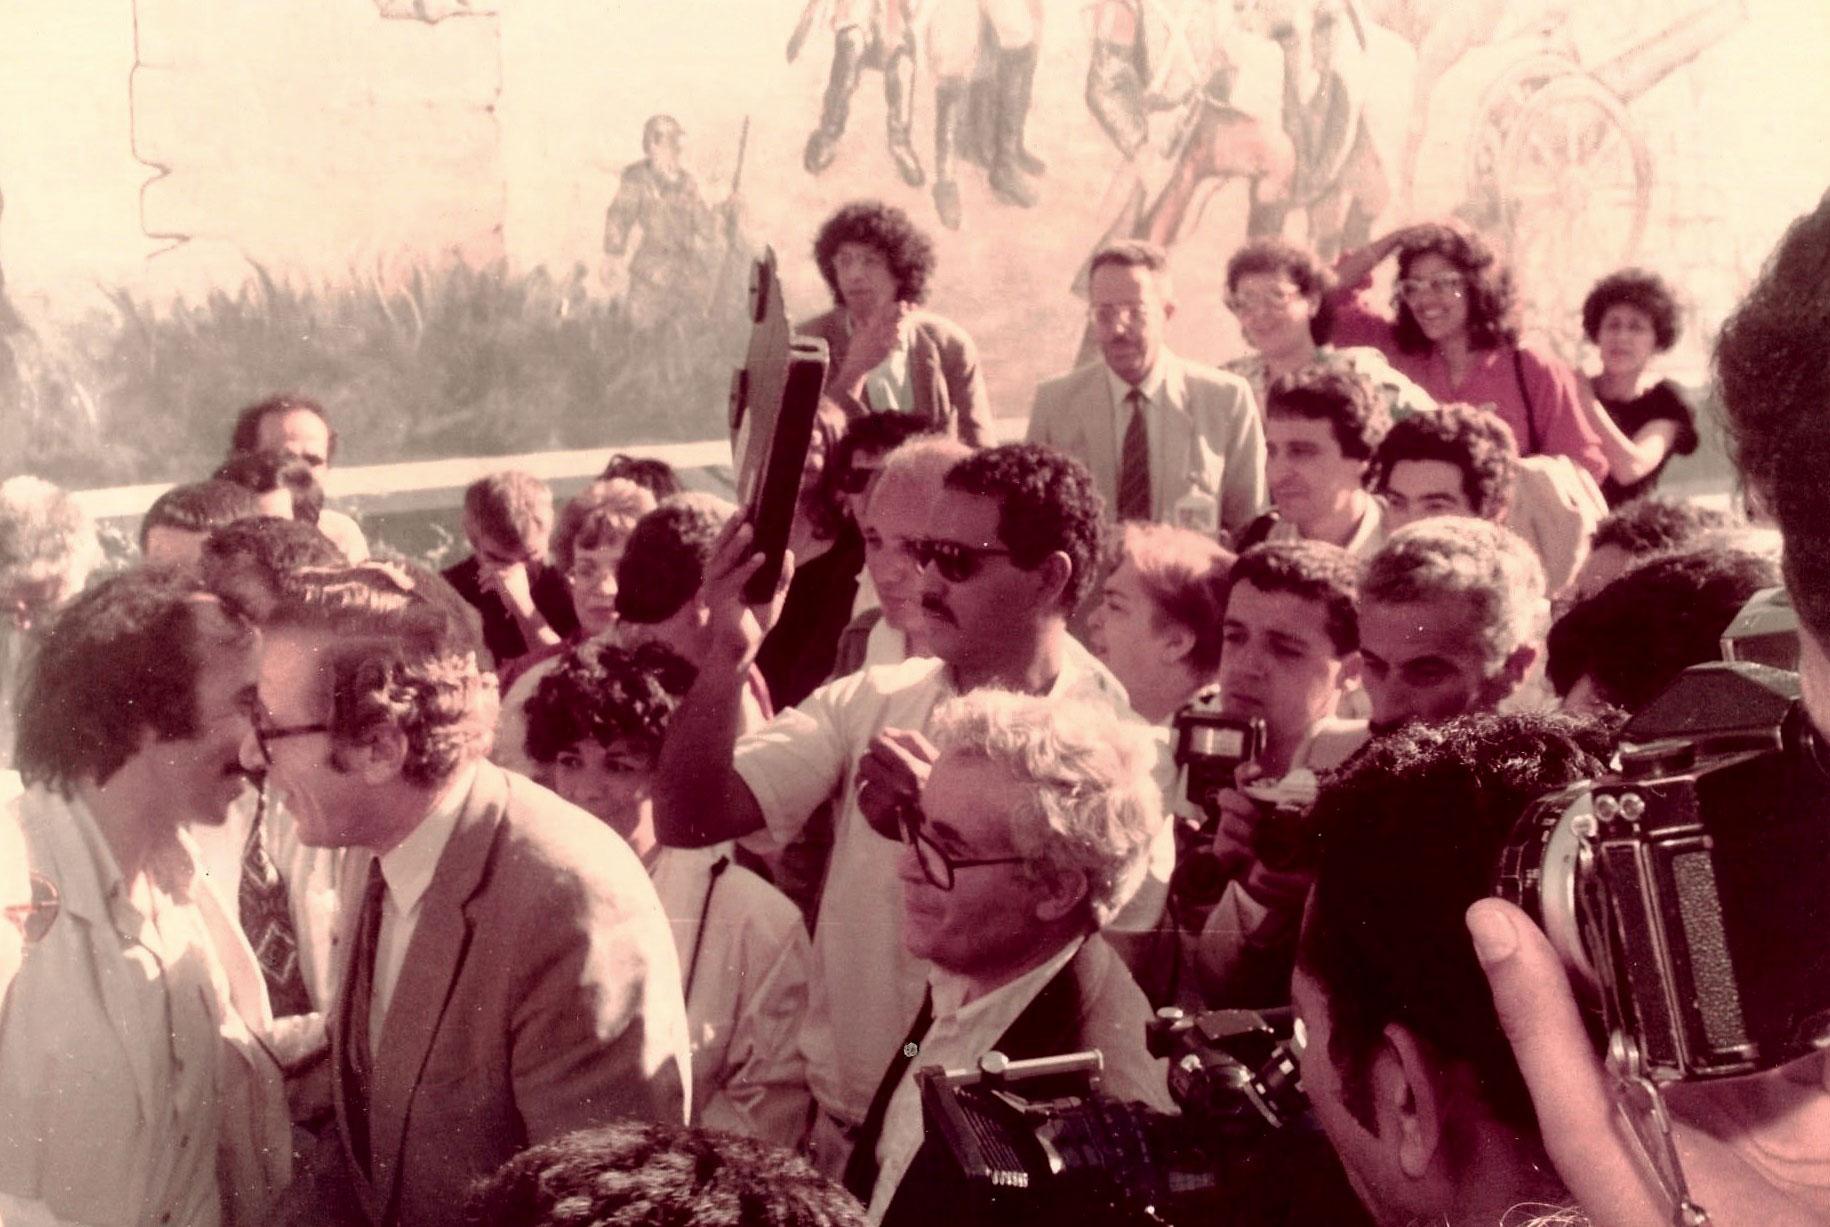 1er-Tour-Manivelle-Annaba,-JP-Lledo,-Préfet-Sidi-Said---Juin--1988-LUMIERES-2-